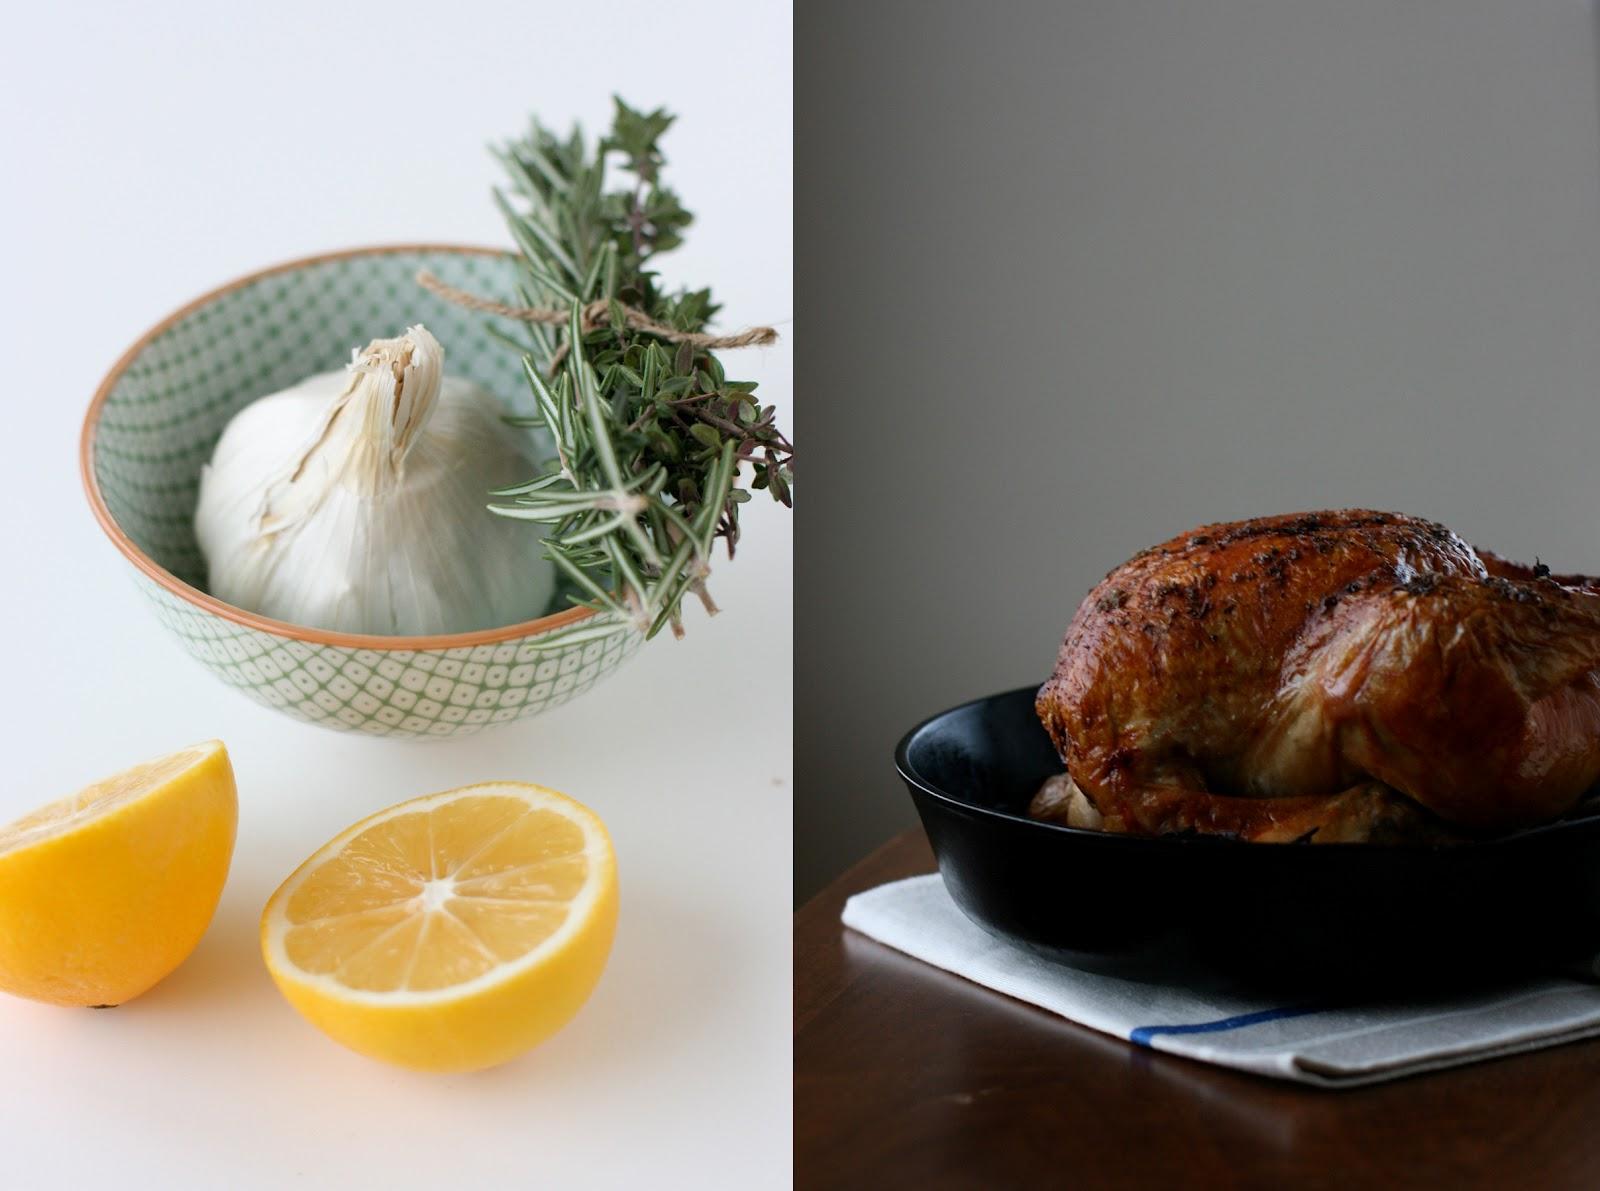 ... : Simple Recipes + Meyer Lemon Roast Chicken w/ Herbes de Provence